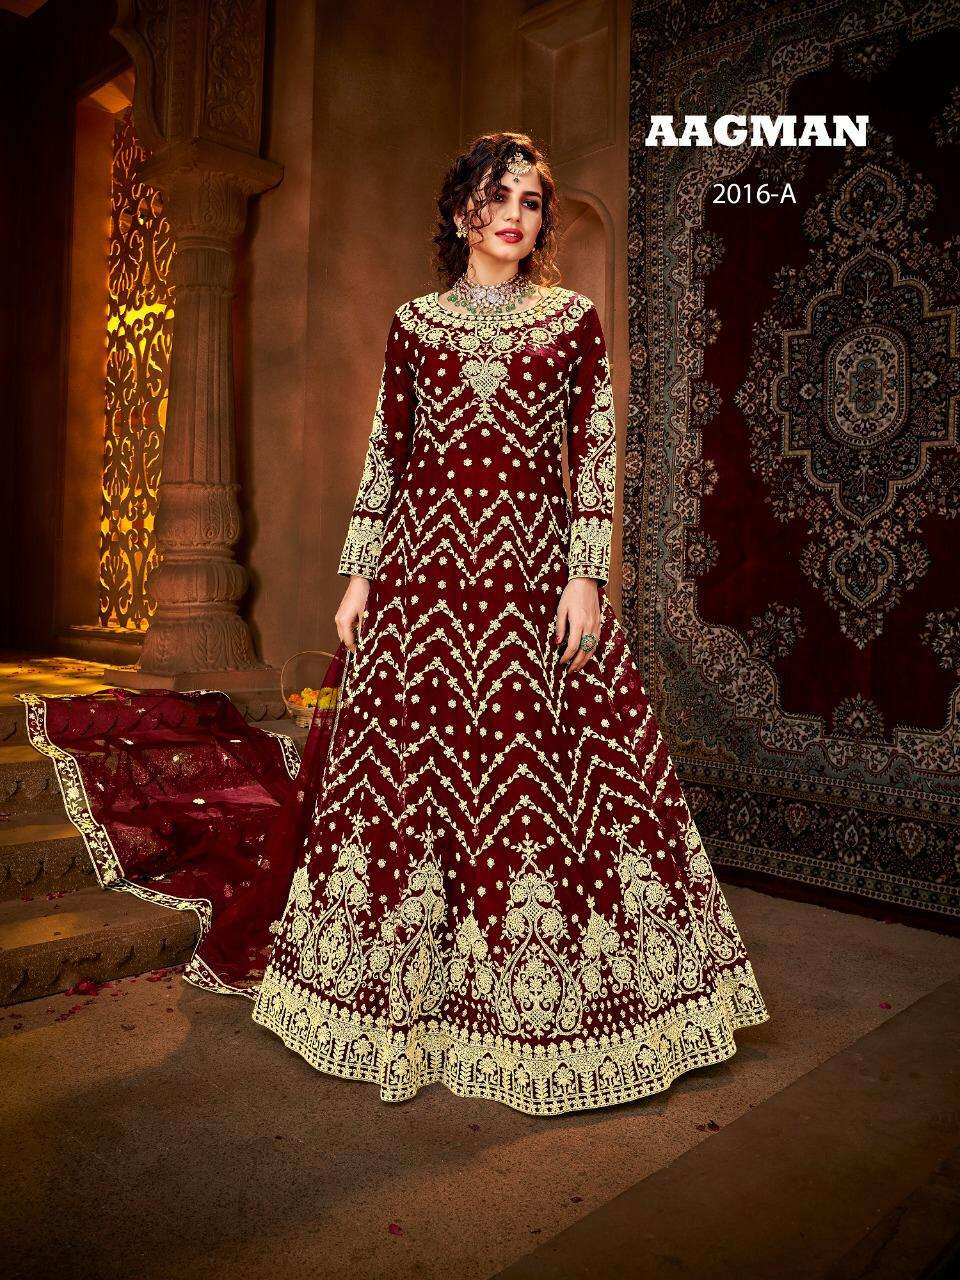 Avighaya Aagman Designer Heavy Work Anarkali Dress Catalog Wholesaler